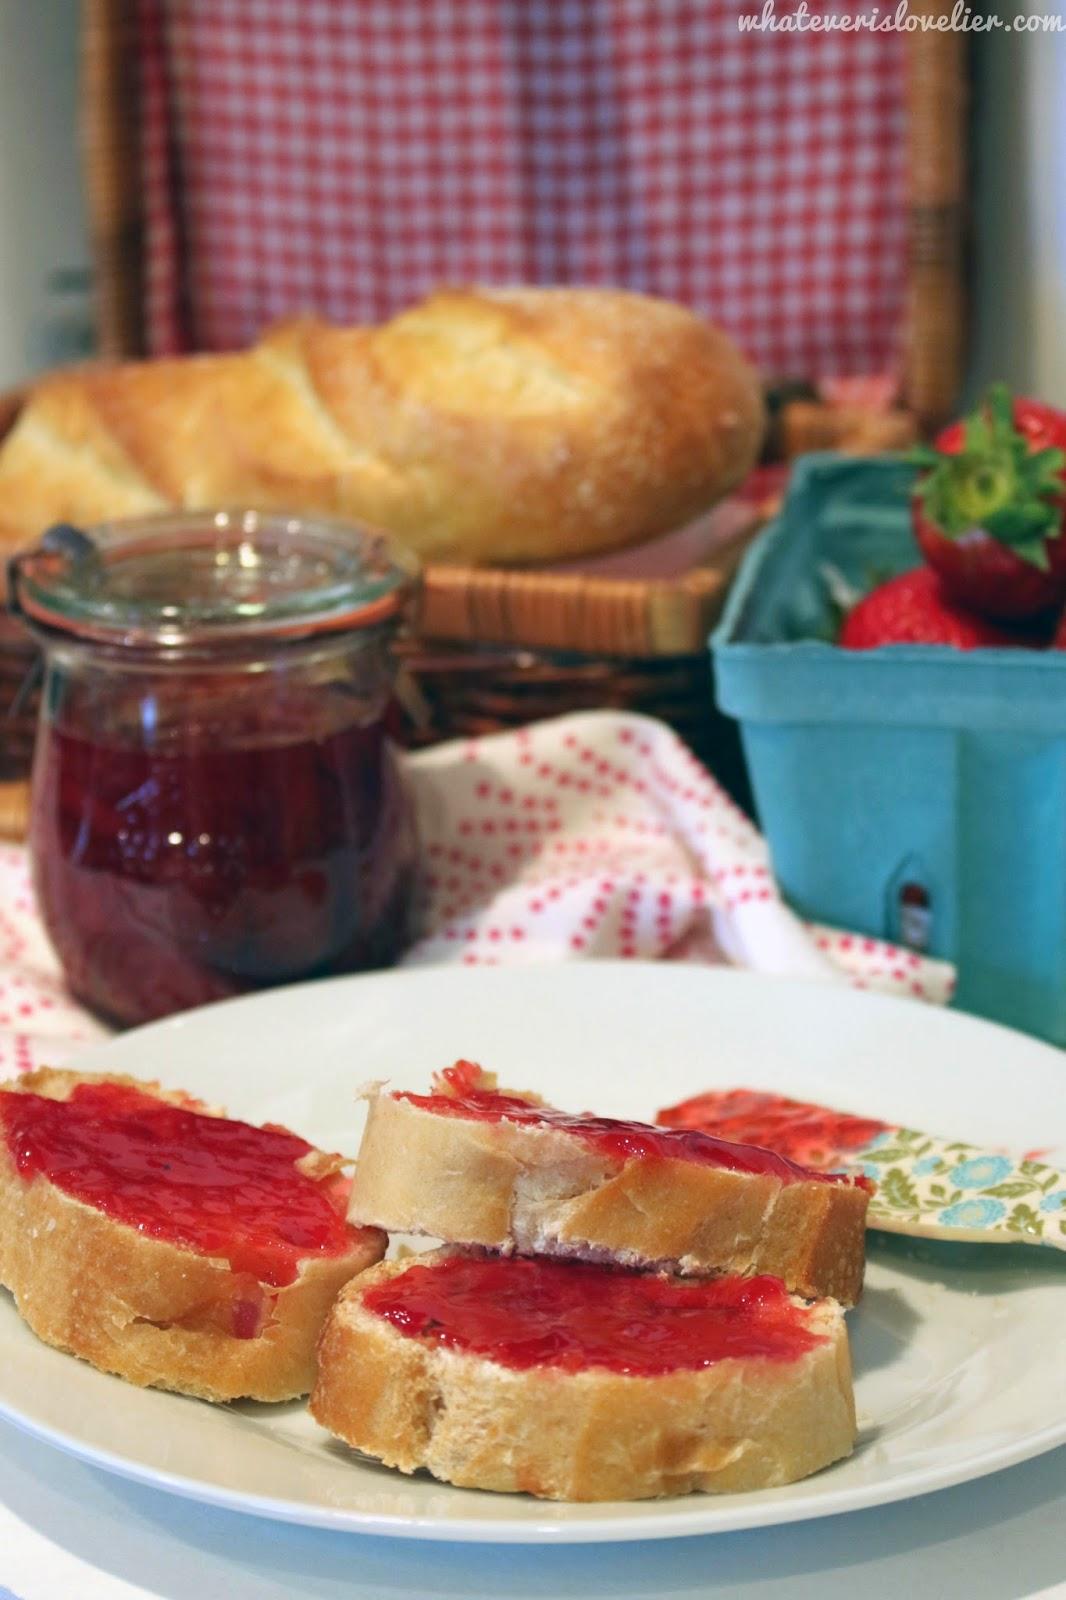 Recipe: Strawberry Basil Jam